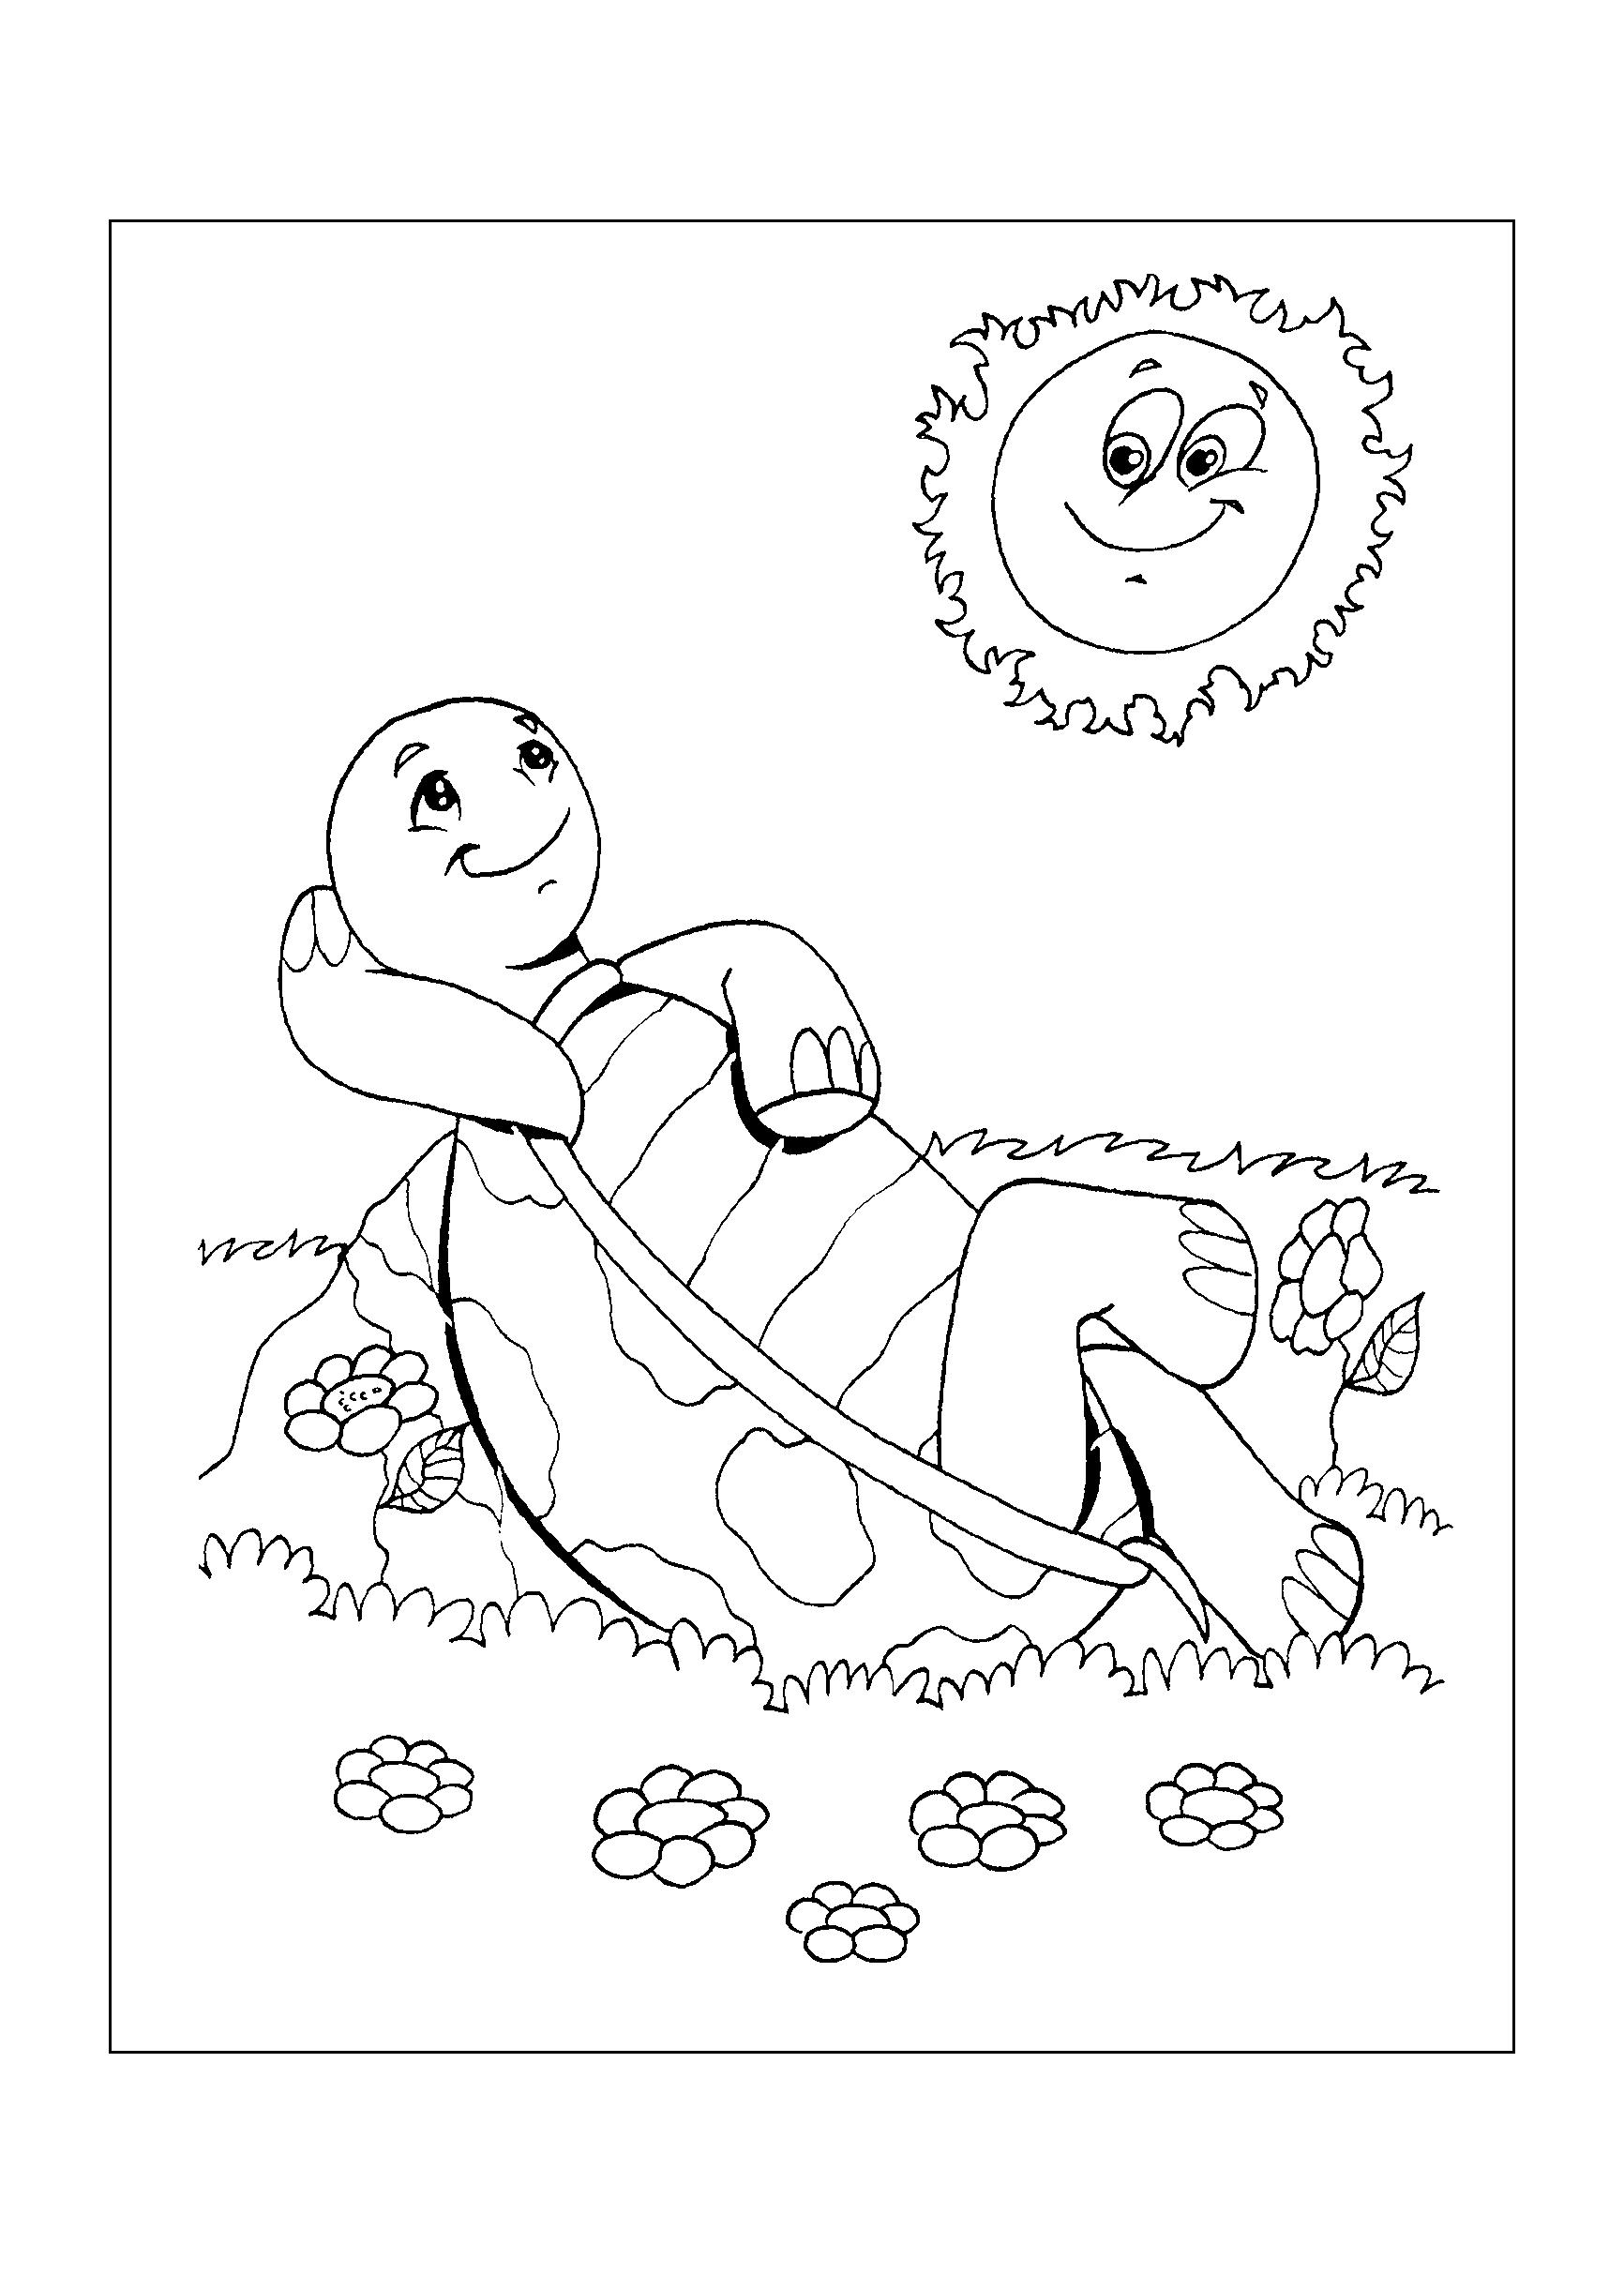 0165-desenho-colorir-tartaruga